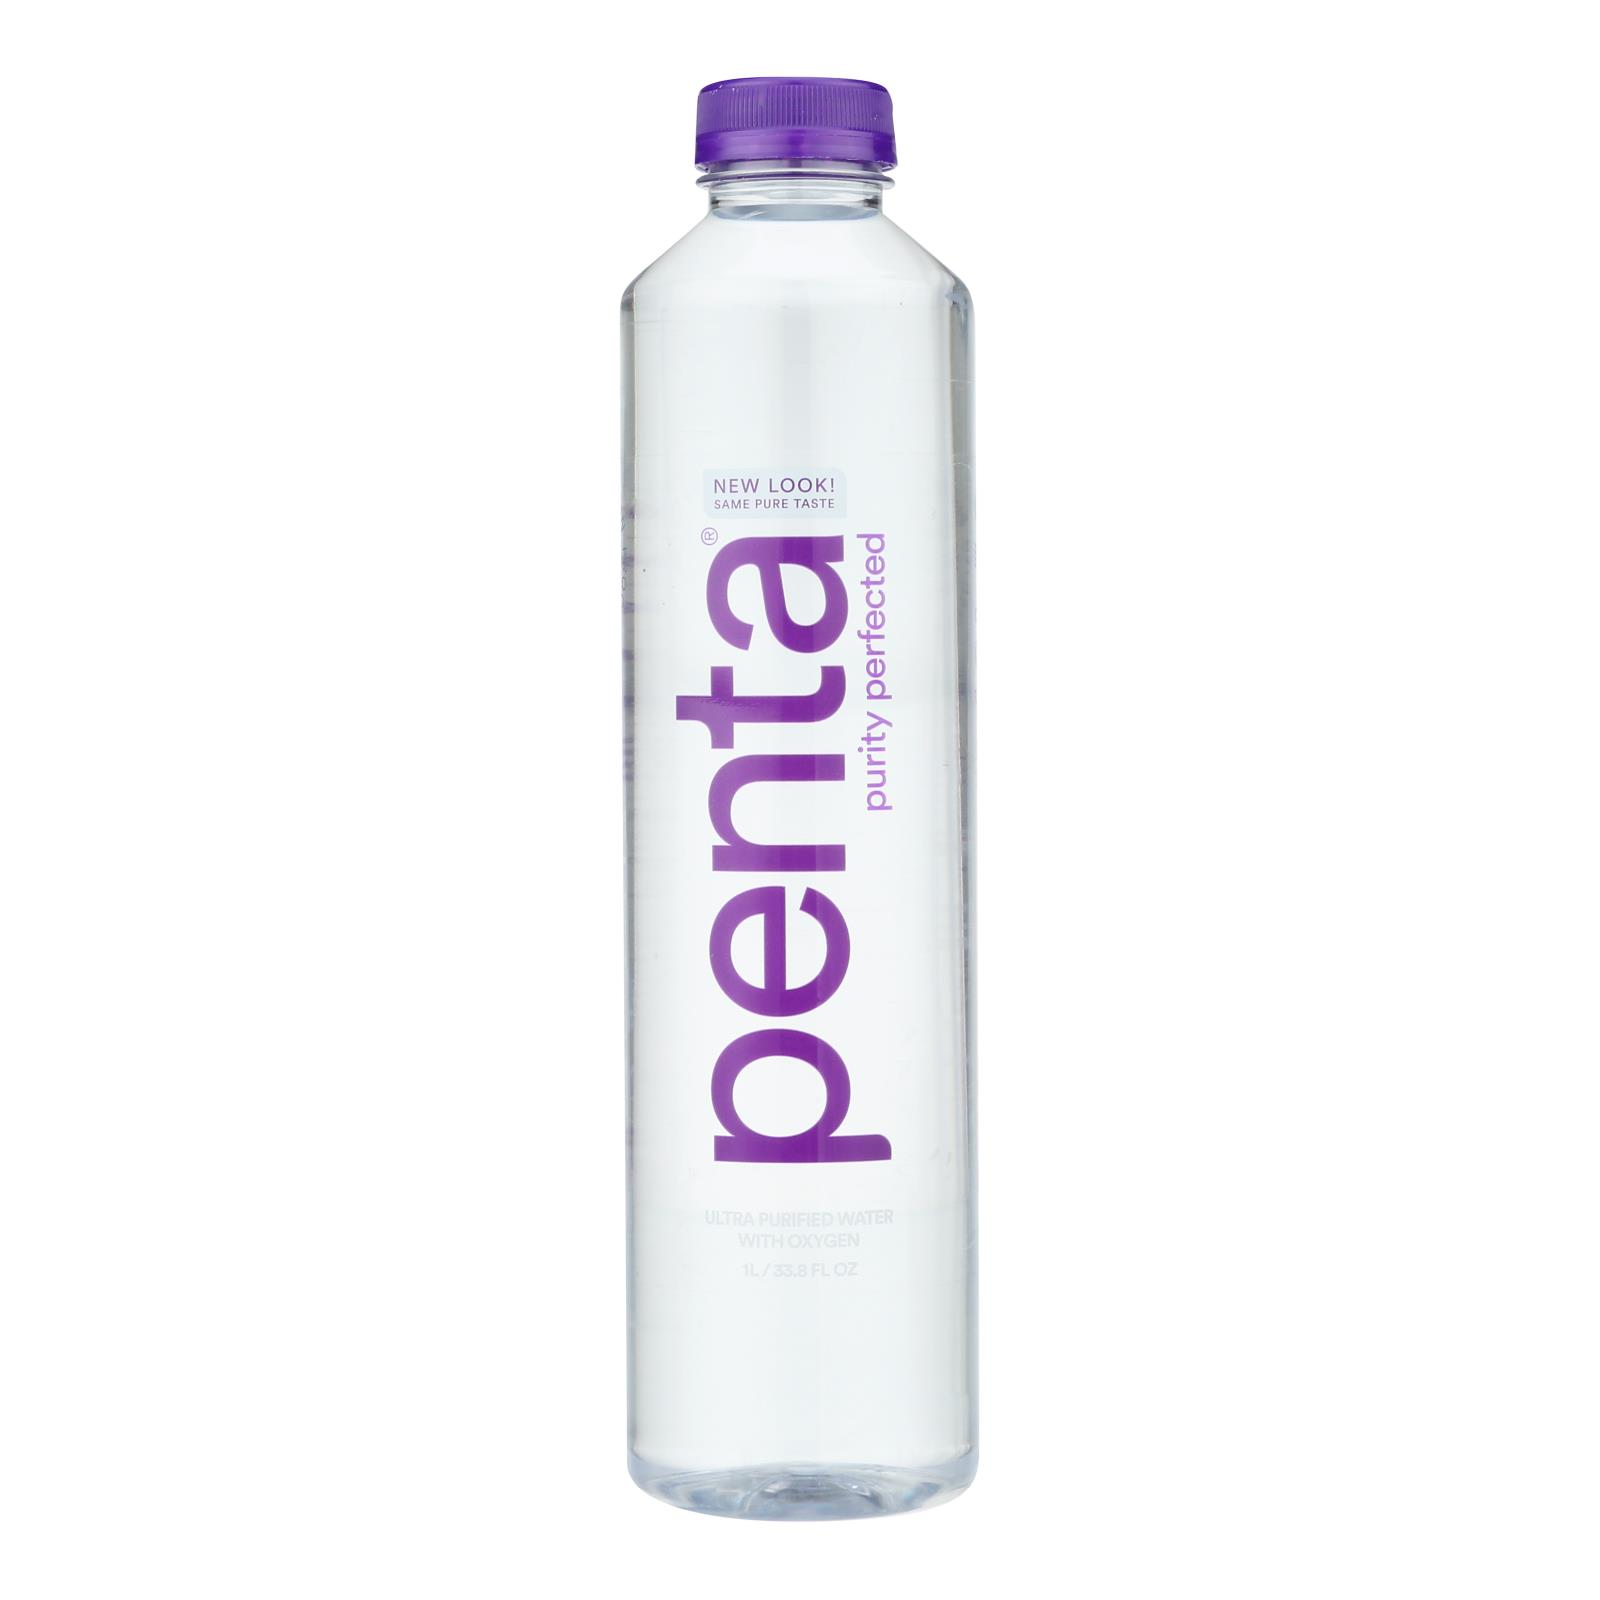 Penta Purified Water Ultra Purified Water - Case of 12 - 1 Liter